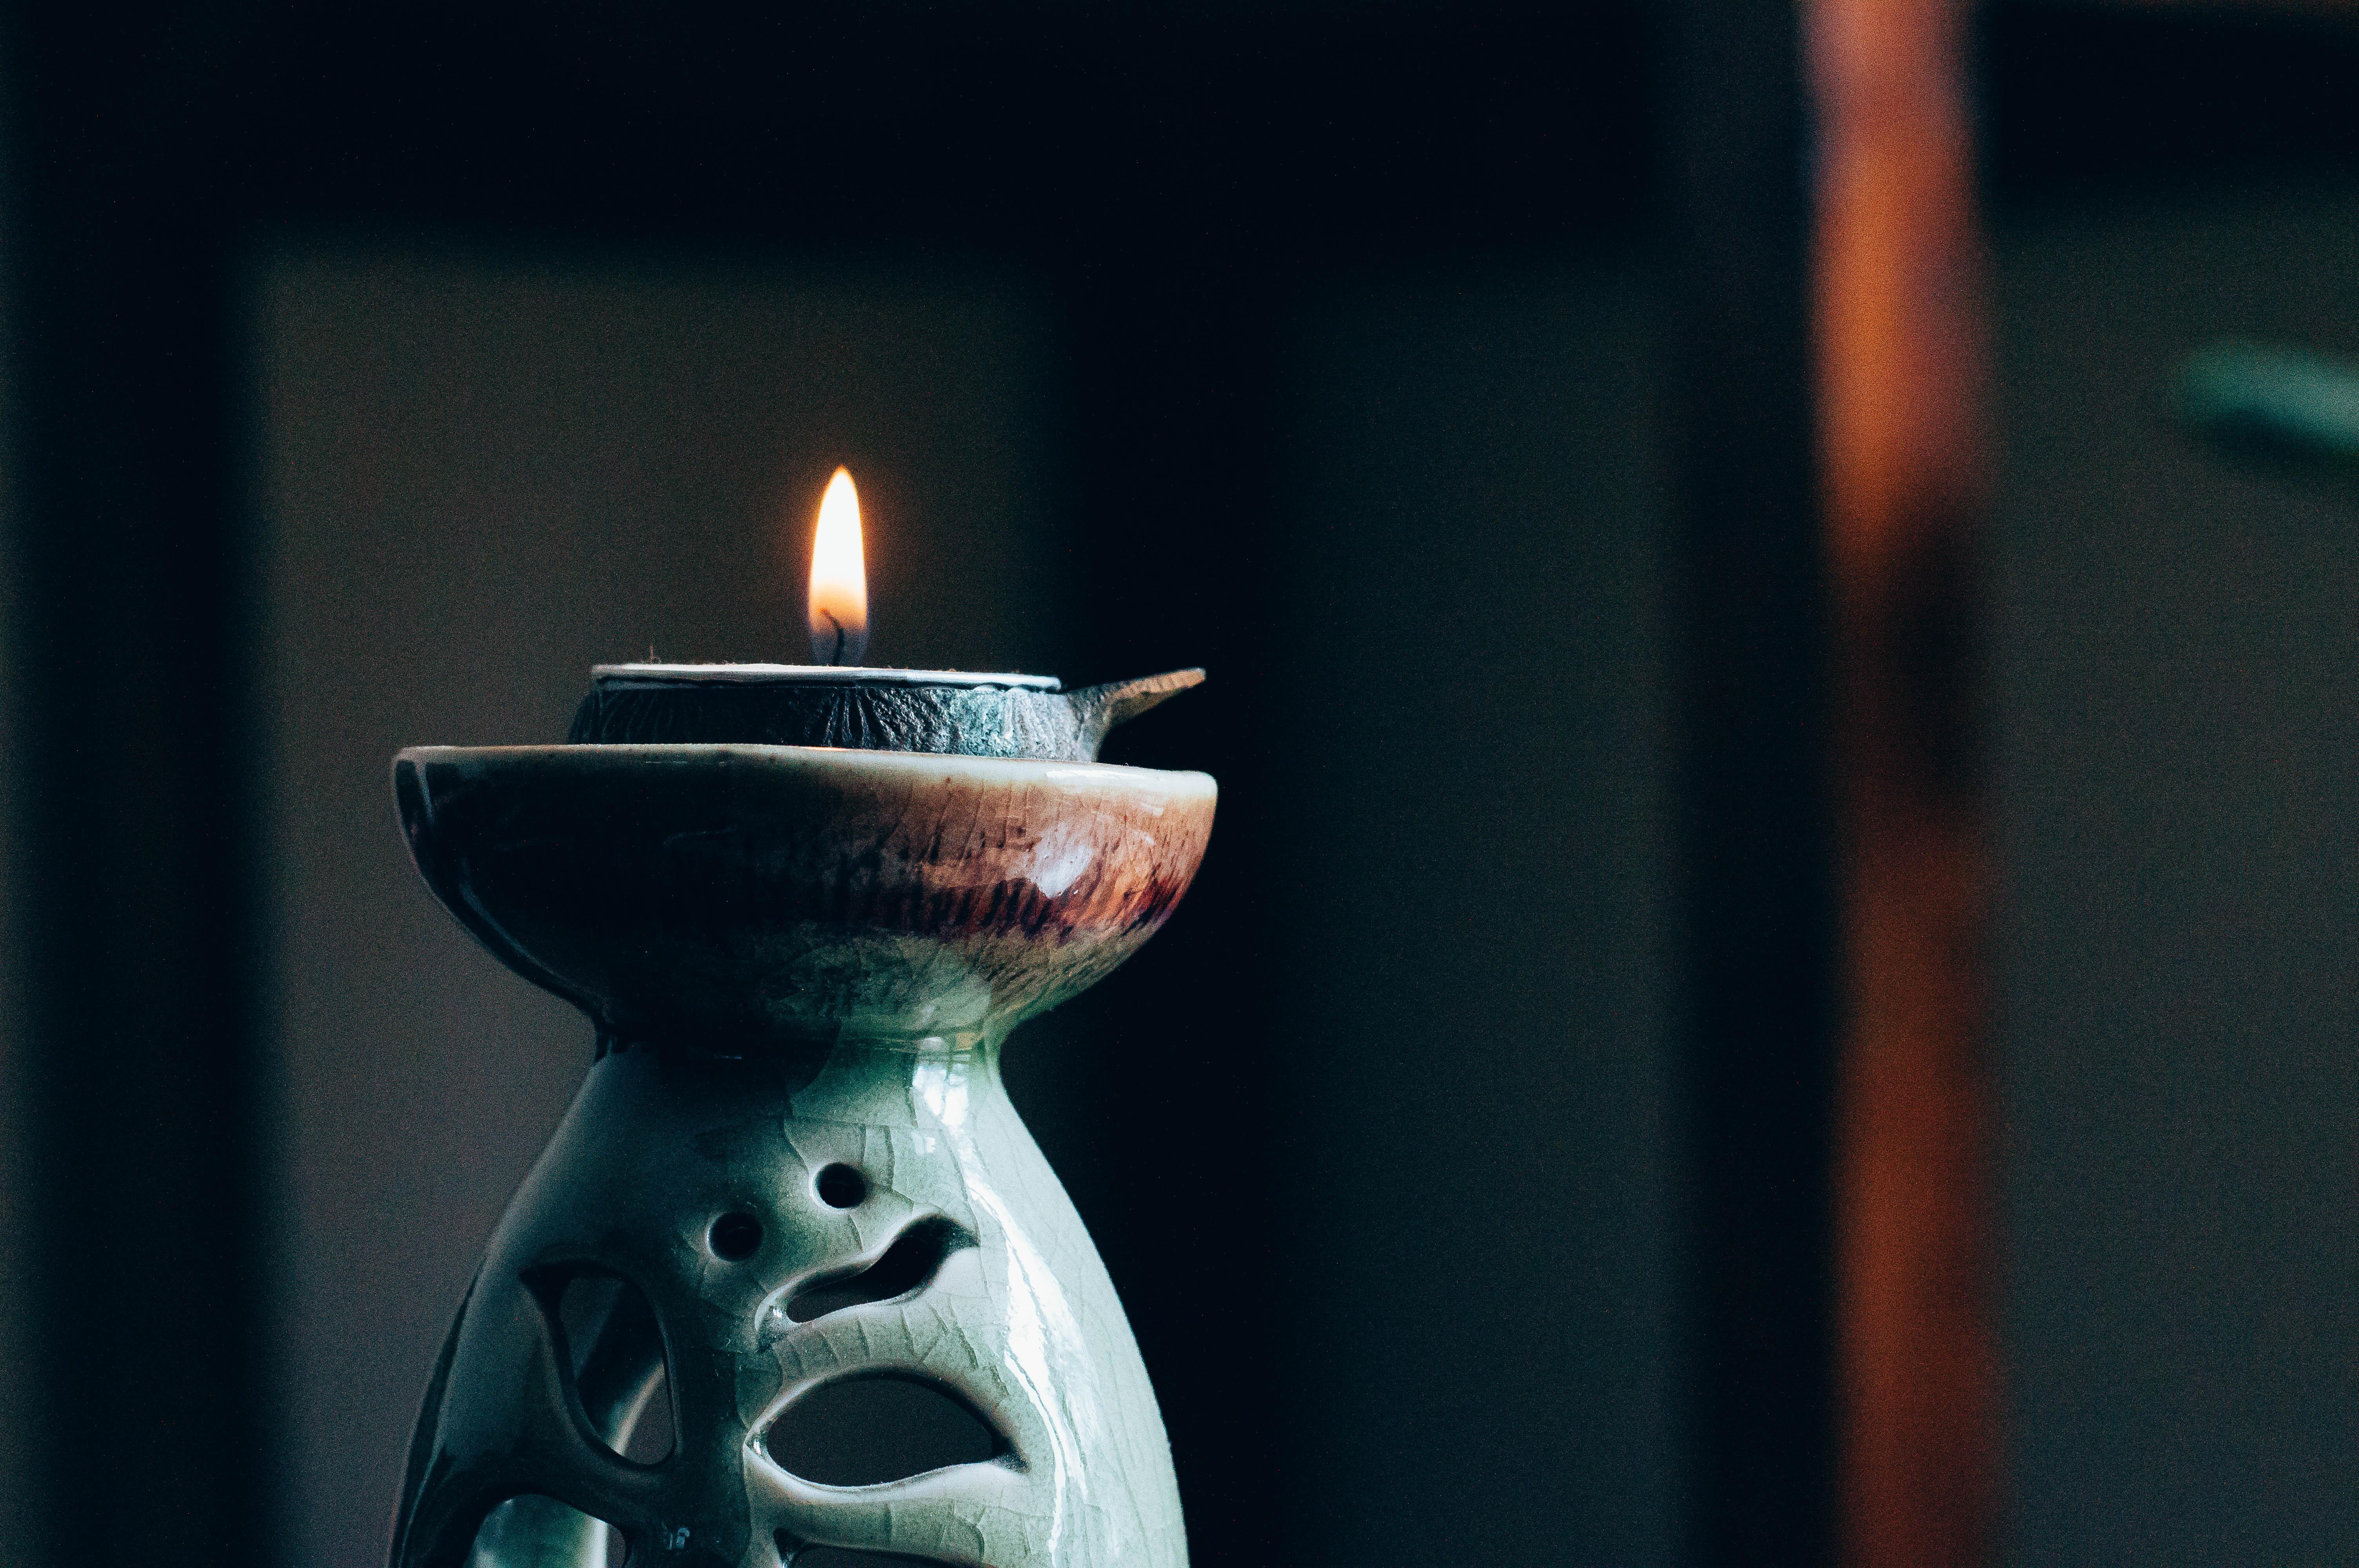 Candle - Image by Hans Vivek via Unsplash